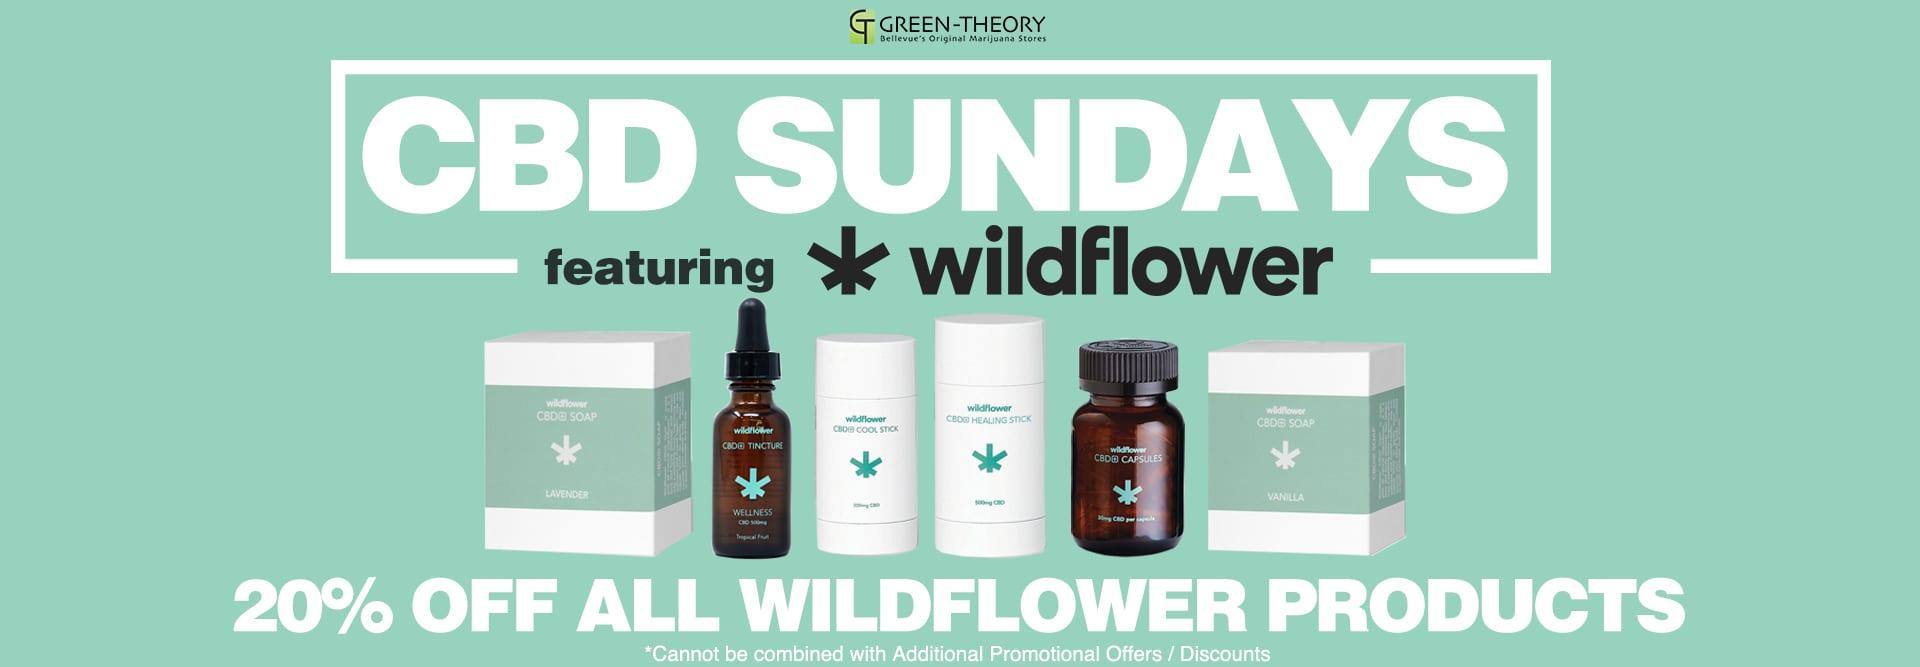 CBD-Sundays-Wildflower-Slider